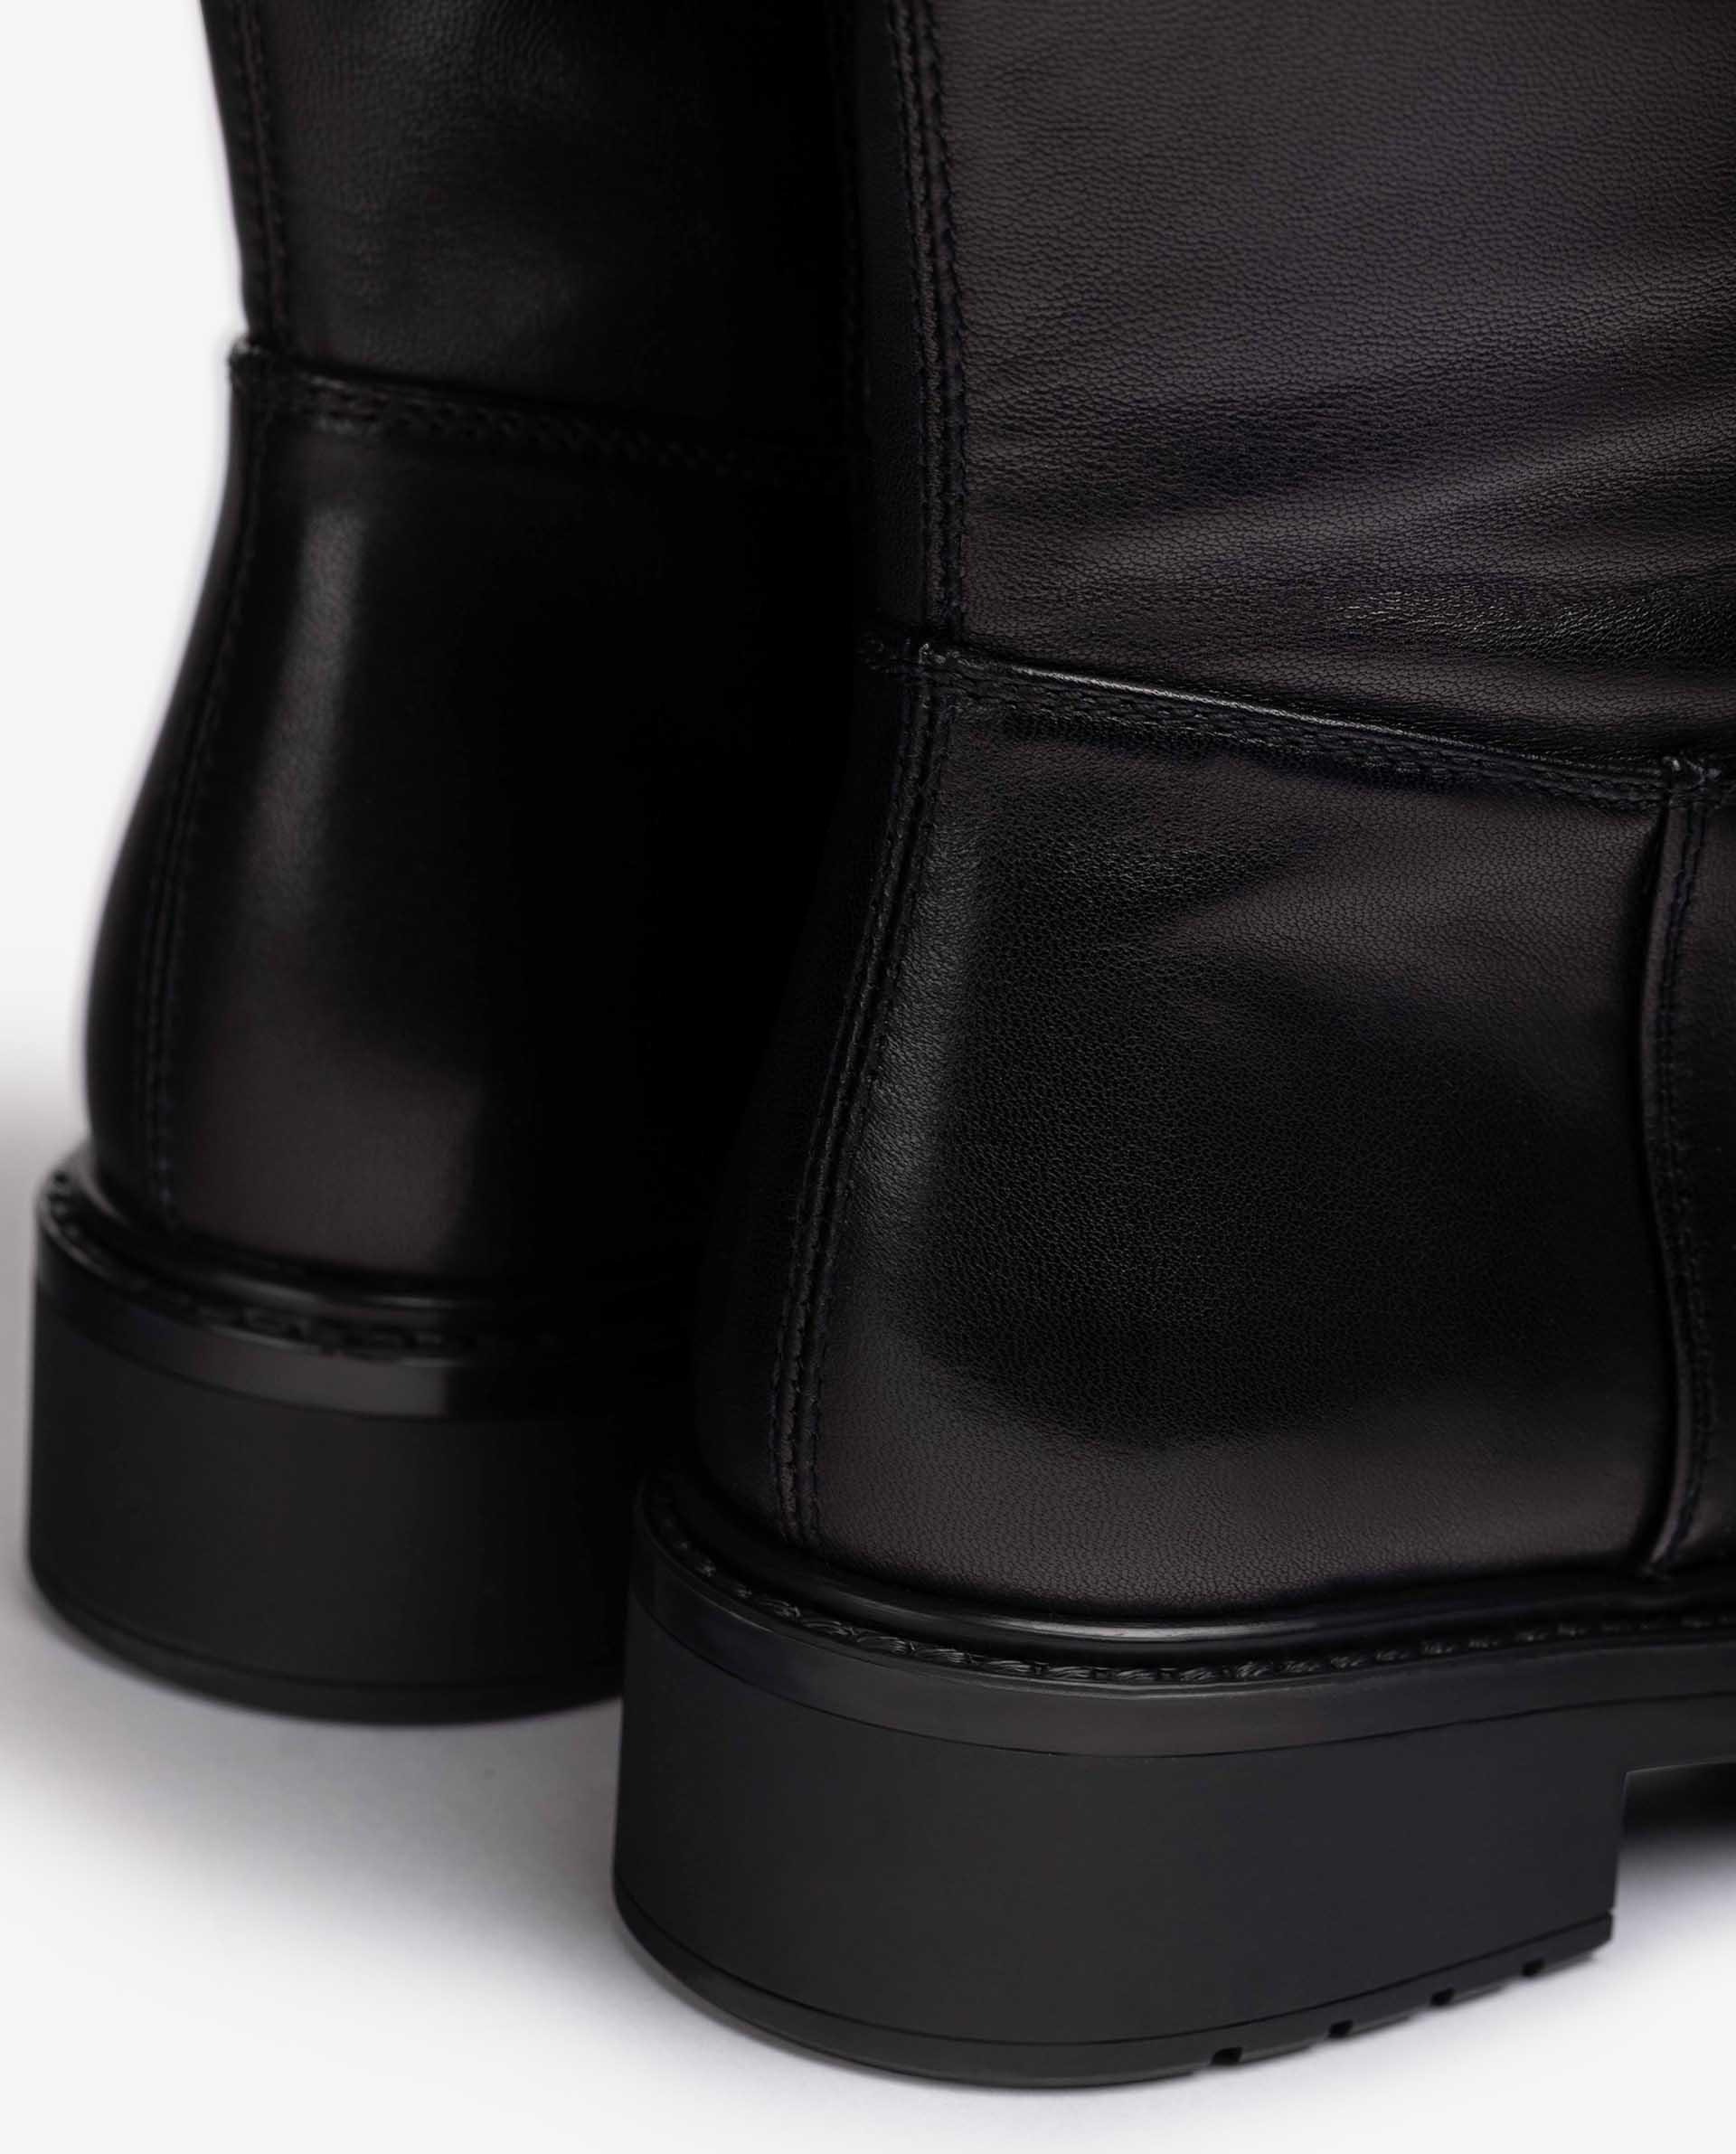 Unisa Stiefel ETAM_VU black